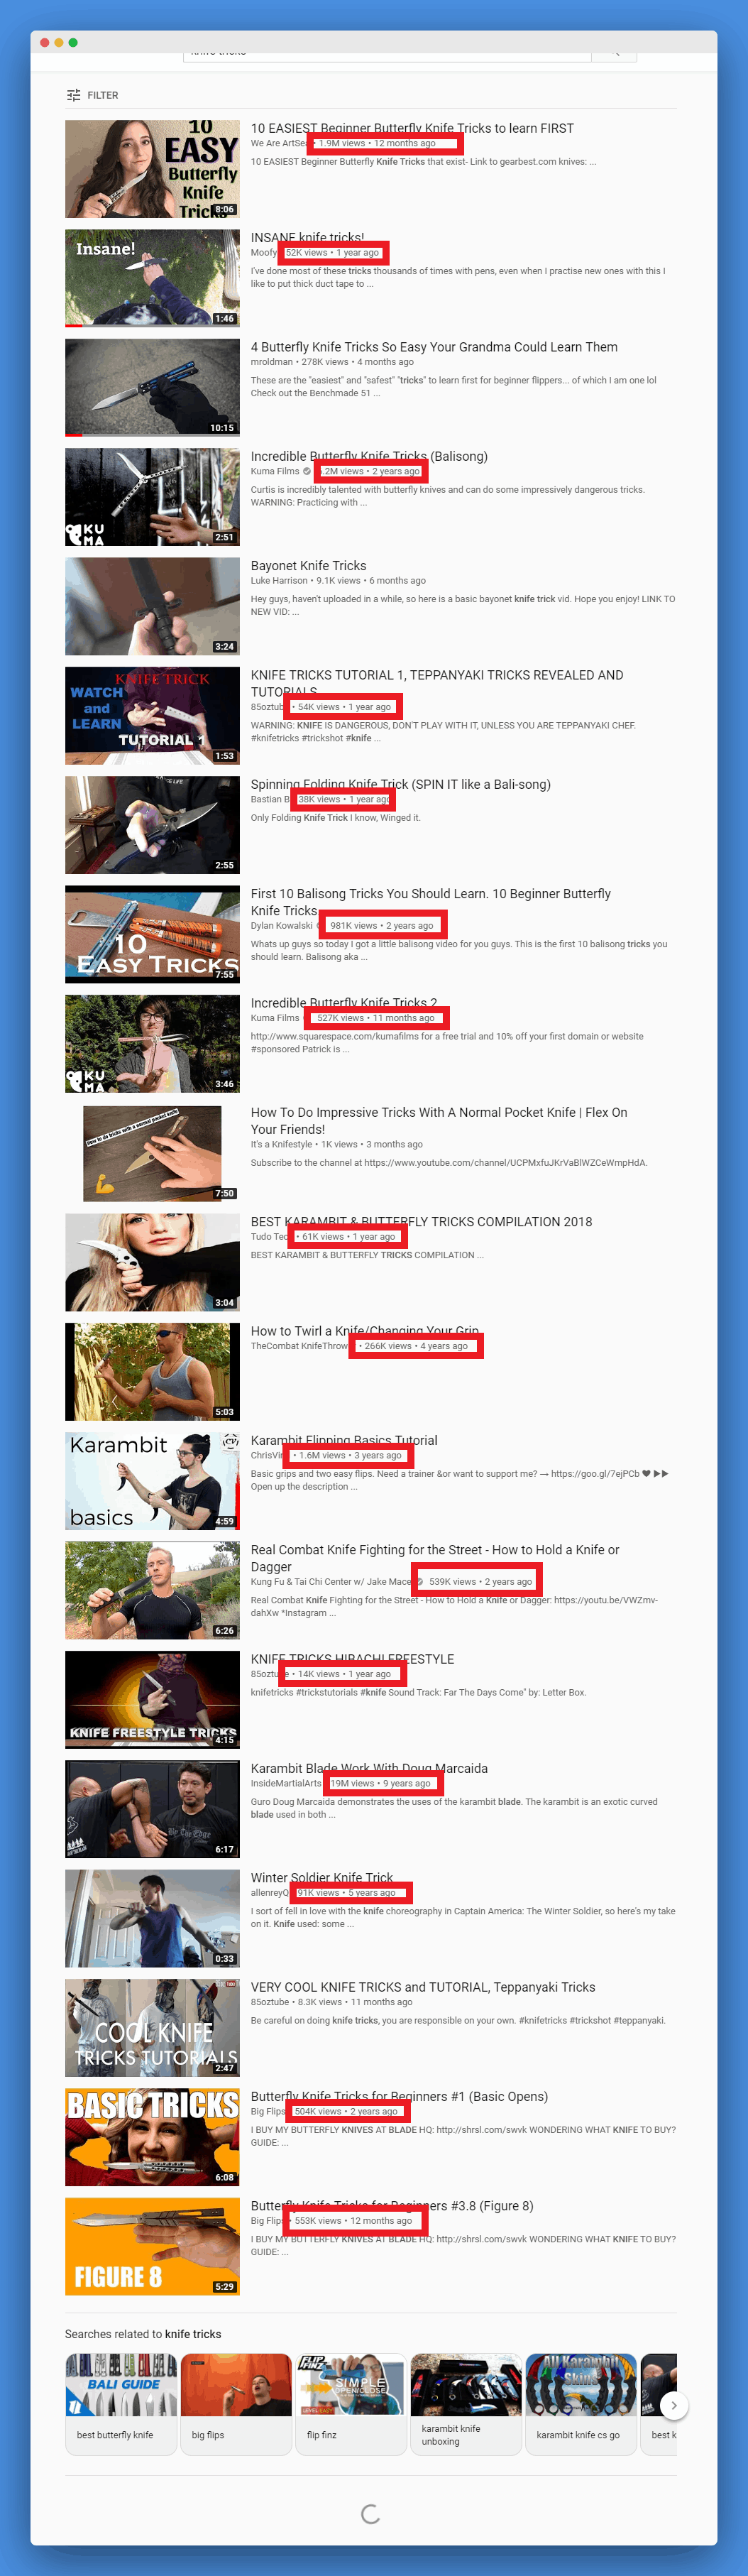 why youtube affiliate marketing works